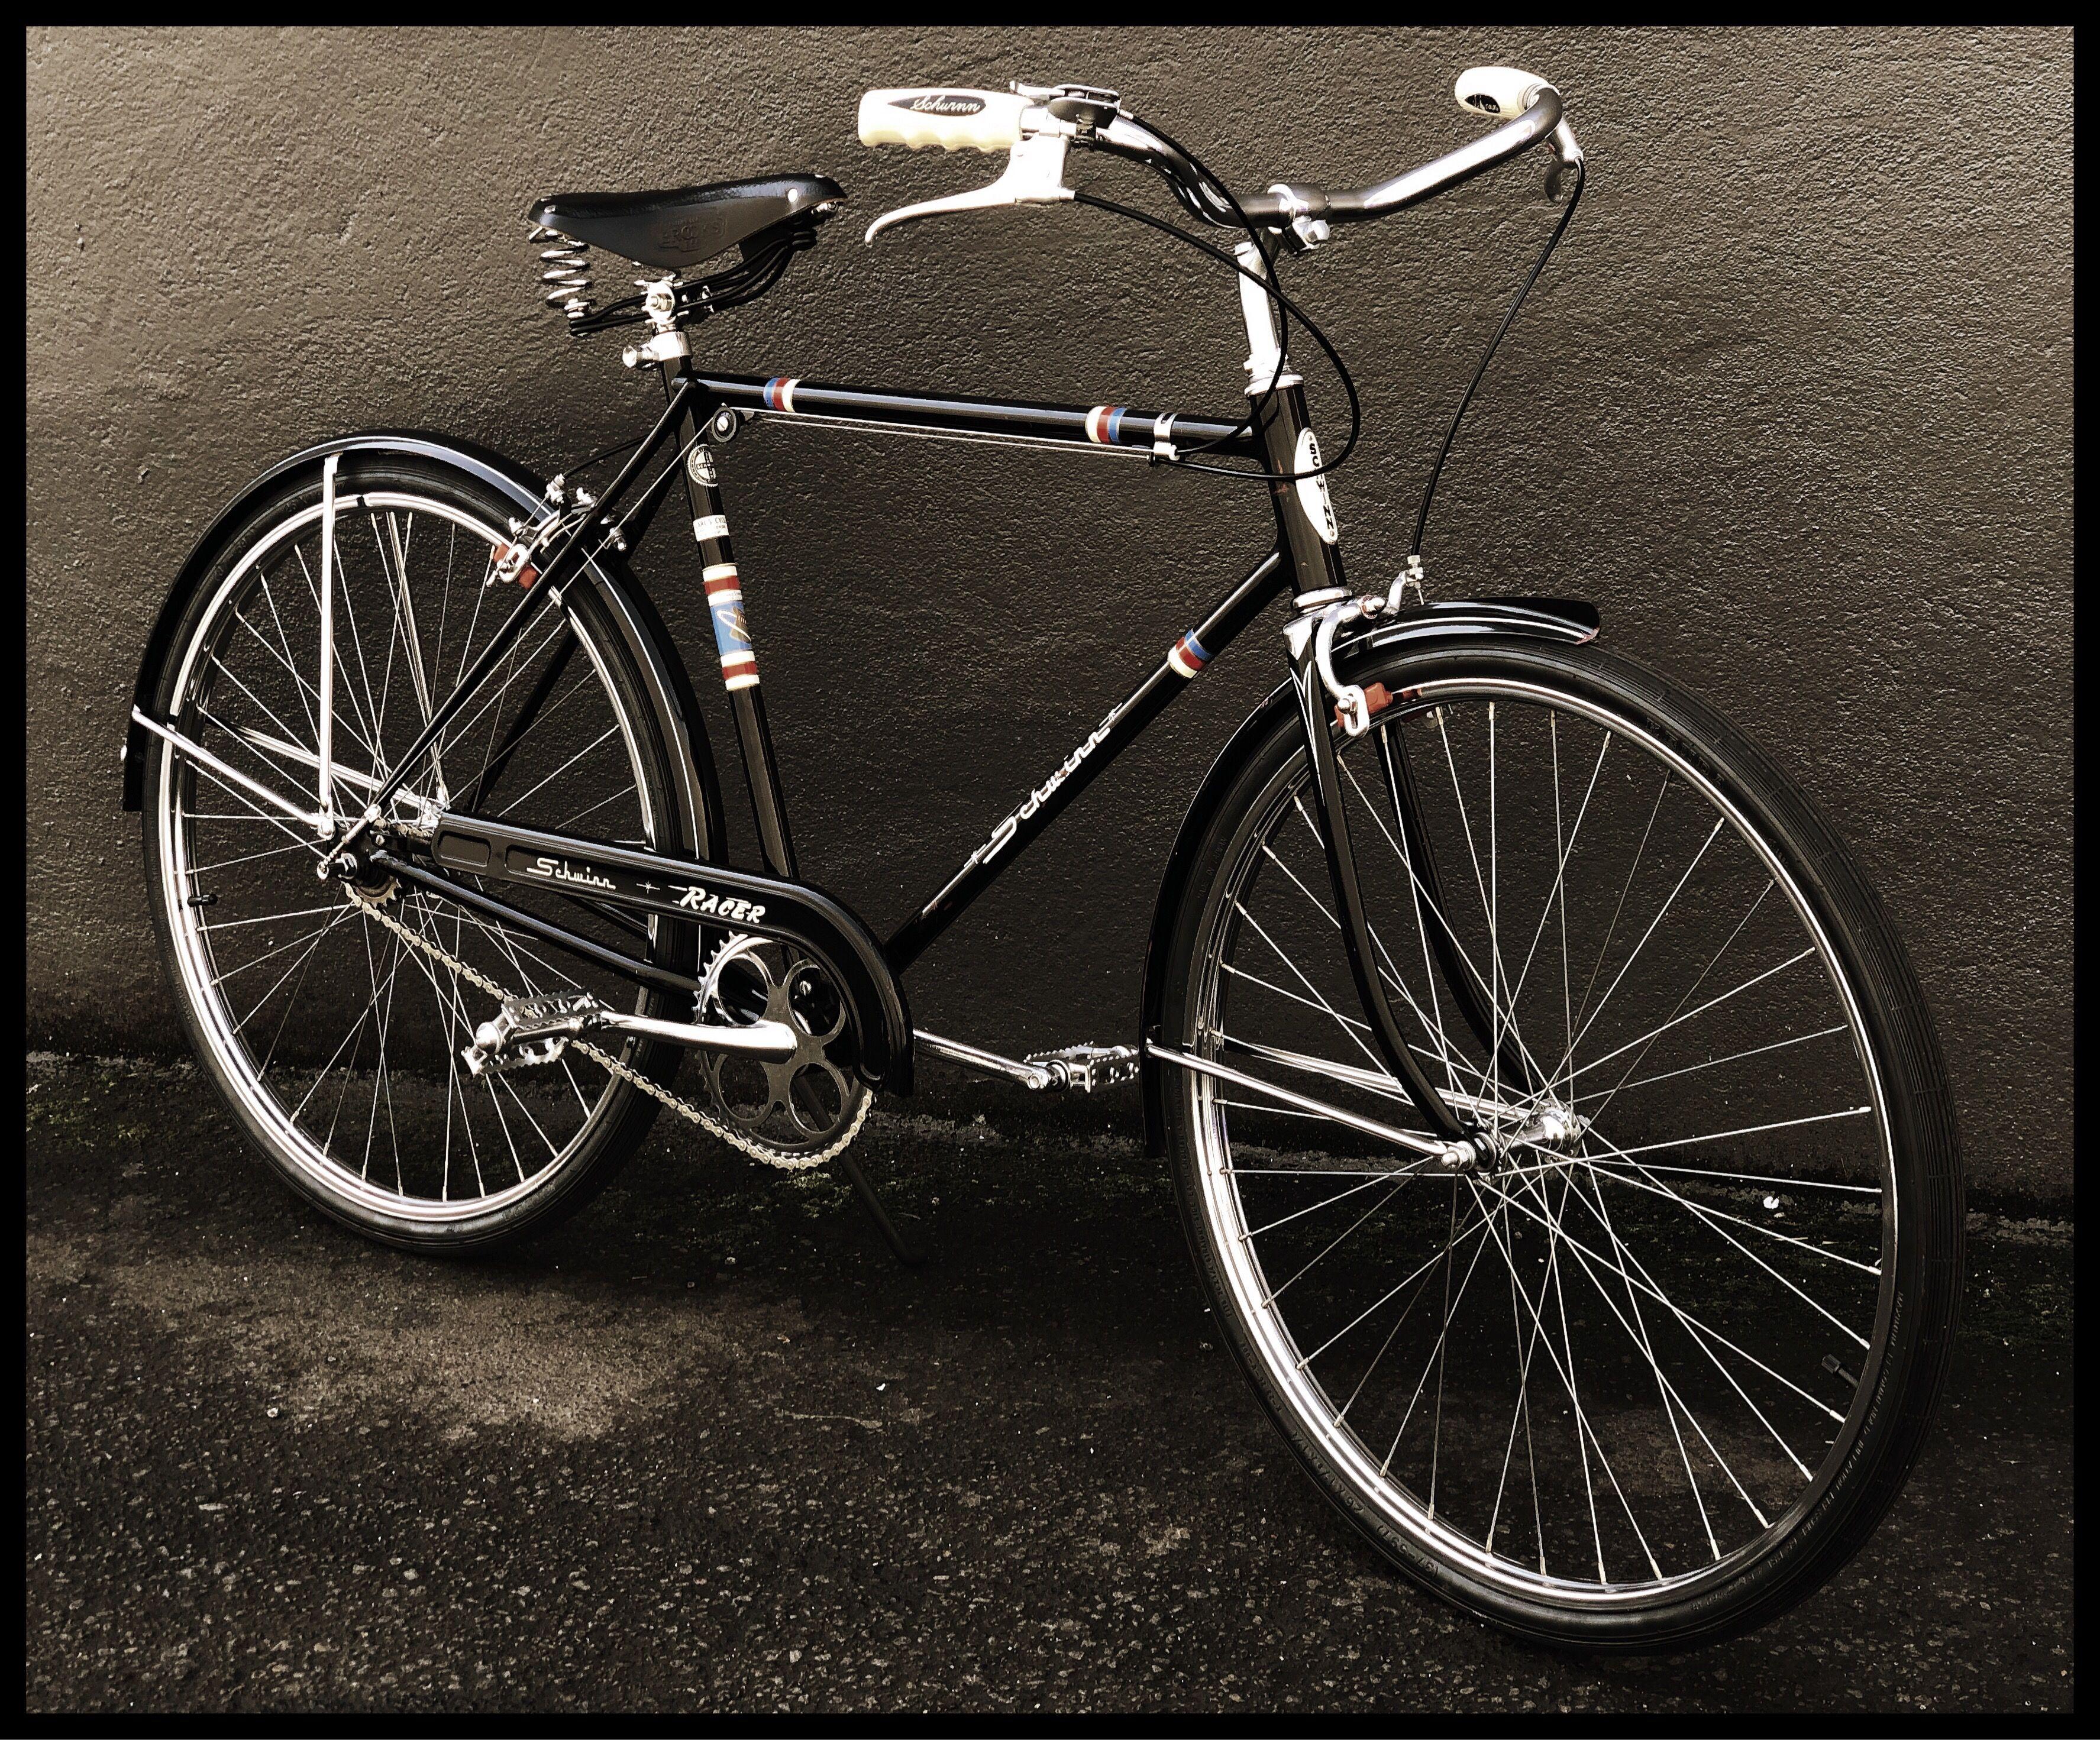 f93f40a62eb 1963 Schwinn Racer 3 speed | Bicycles | Bicycle, Bike, Fixie